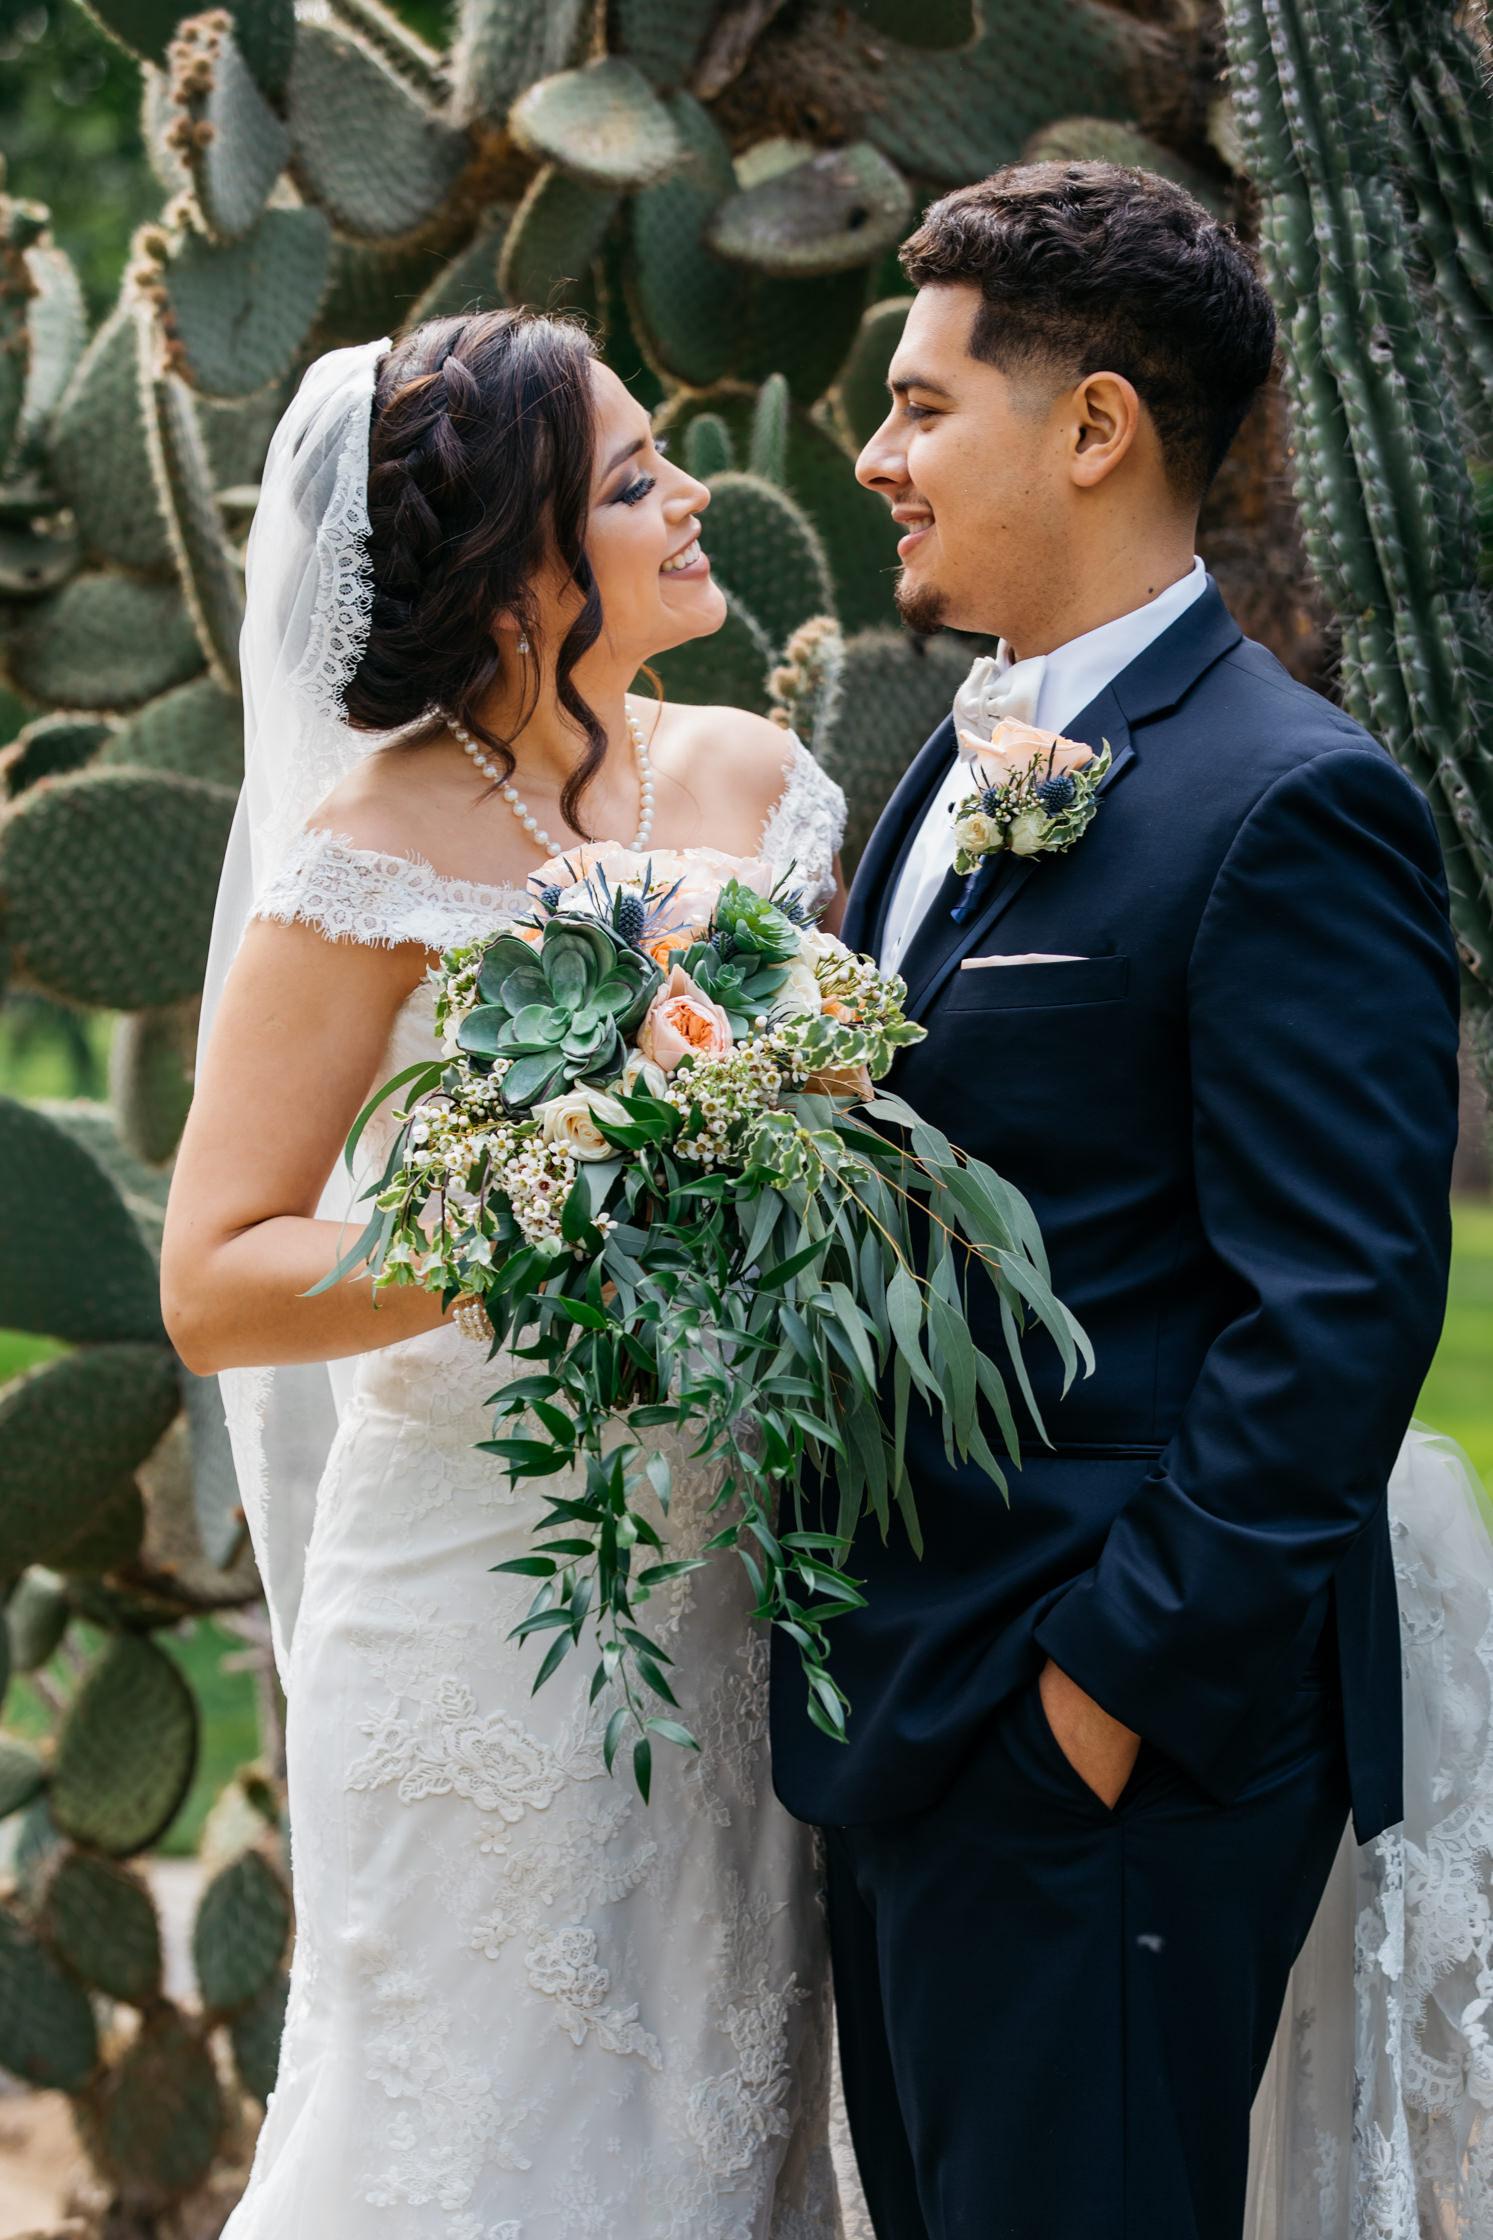 luis_joanna_wedding-53.jpg